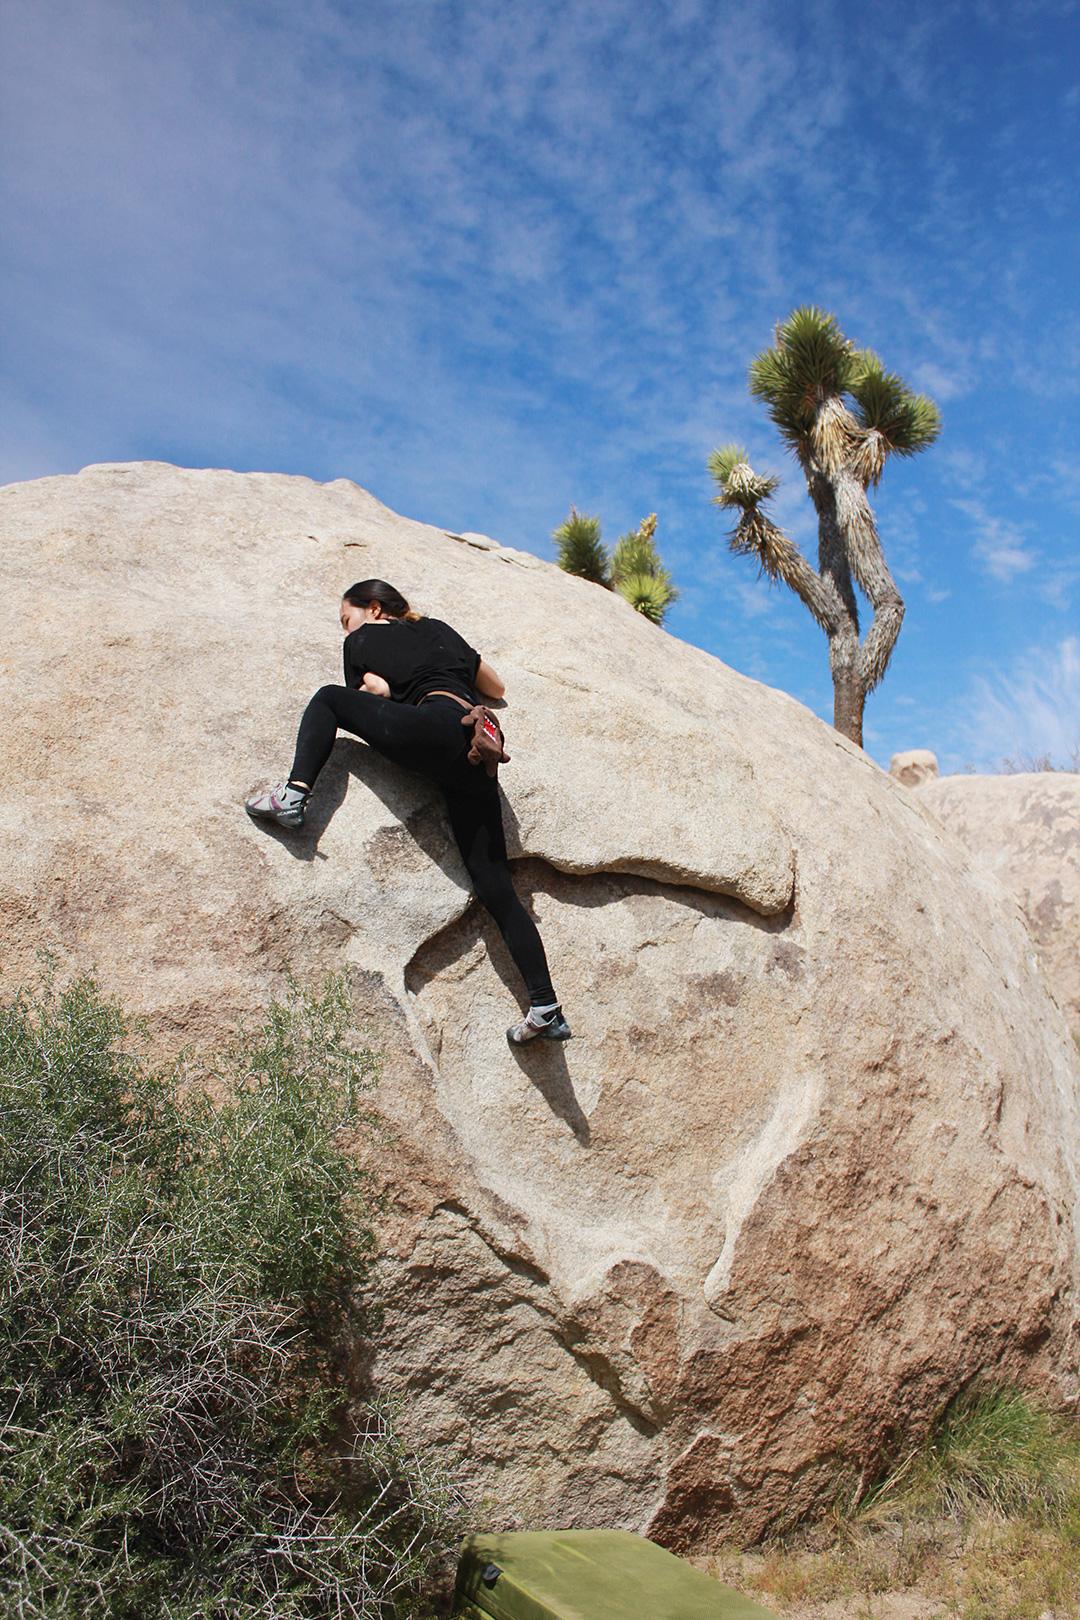 A fun warmup climb!